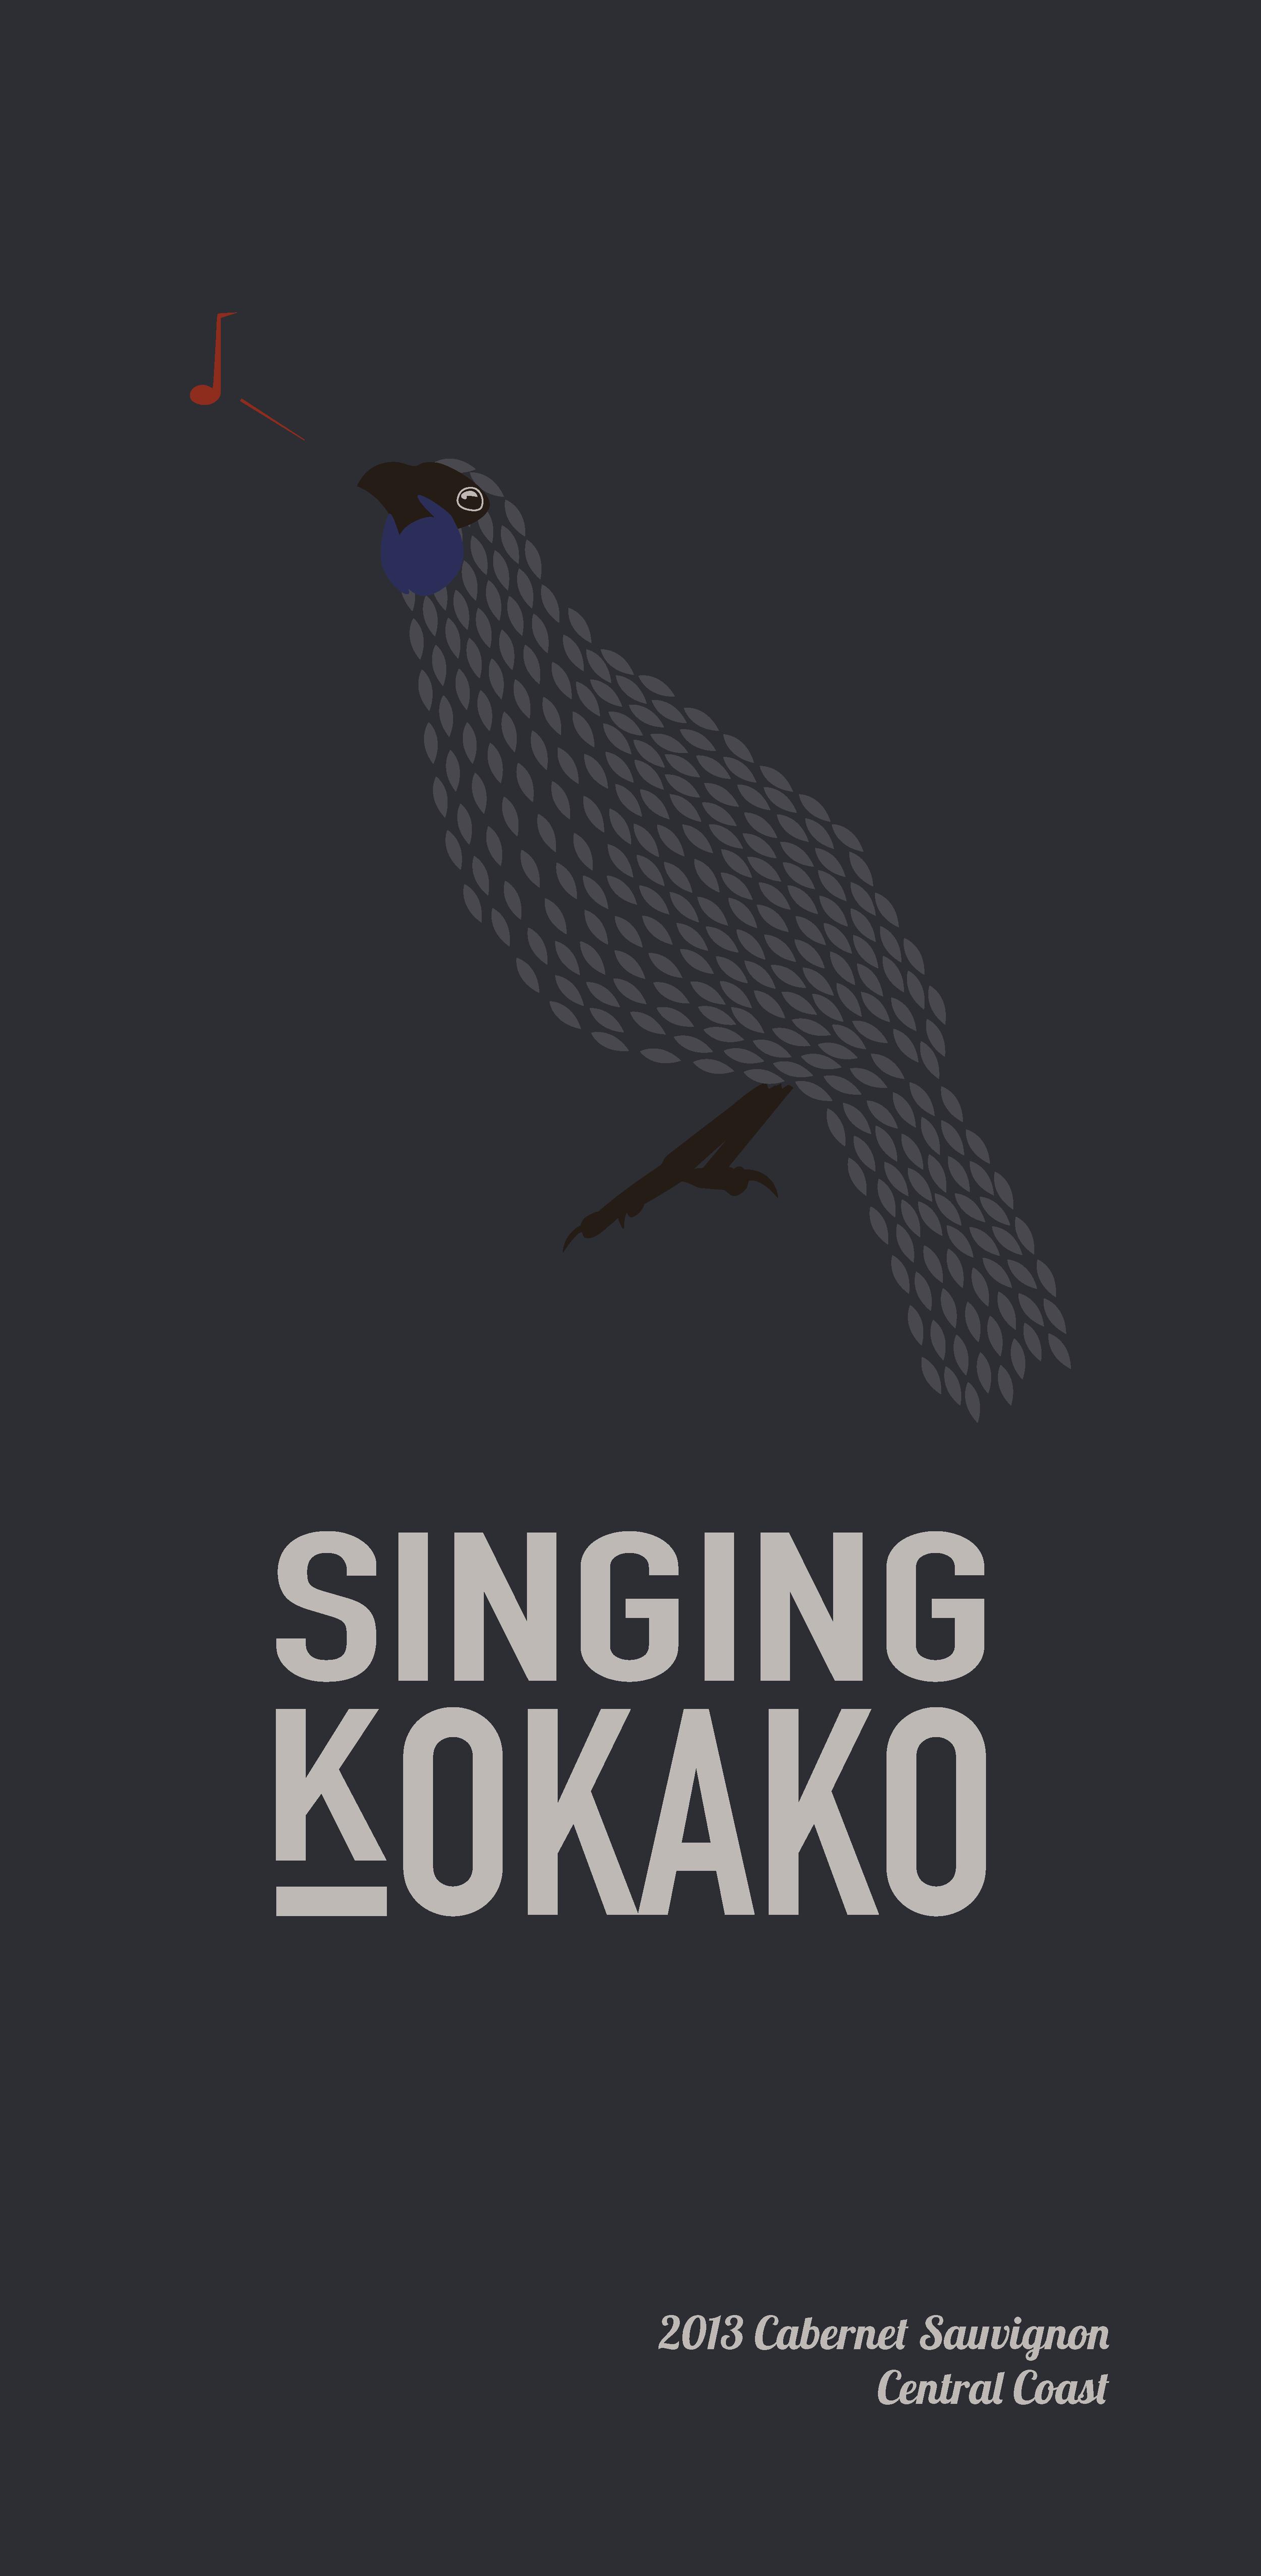 singingkokakowinelabel.png